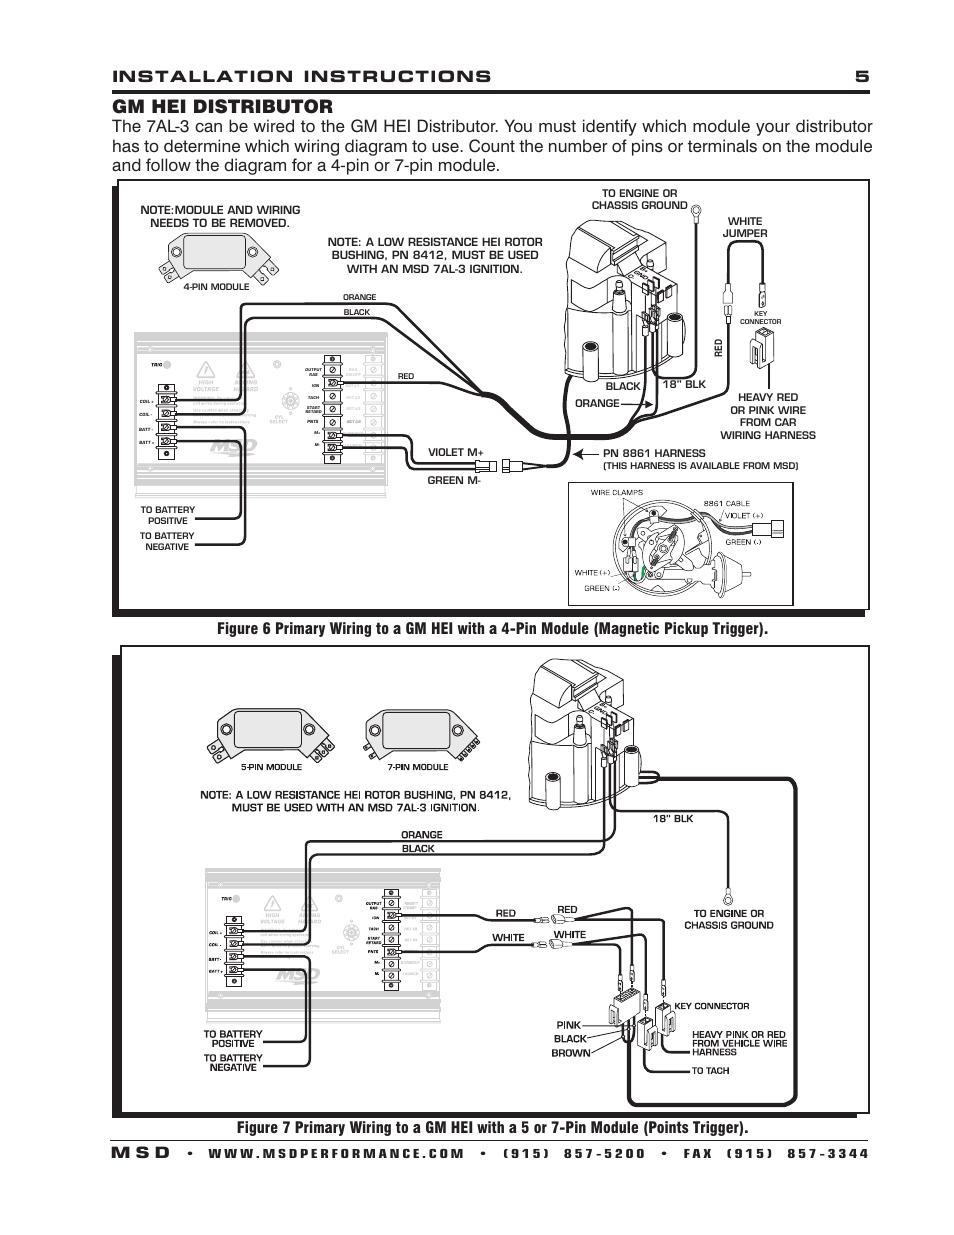 Twintec Ignition System Wiring Diagram - 1967 Camaro Dash Wiring Harness  Diagram scotts-s1642.au-delice-limousin.fr | Twintec Ignition System Wiring Diagram |  | Bege Wiring Diagram - Bege Wiring Diagram Full Edition